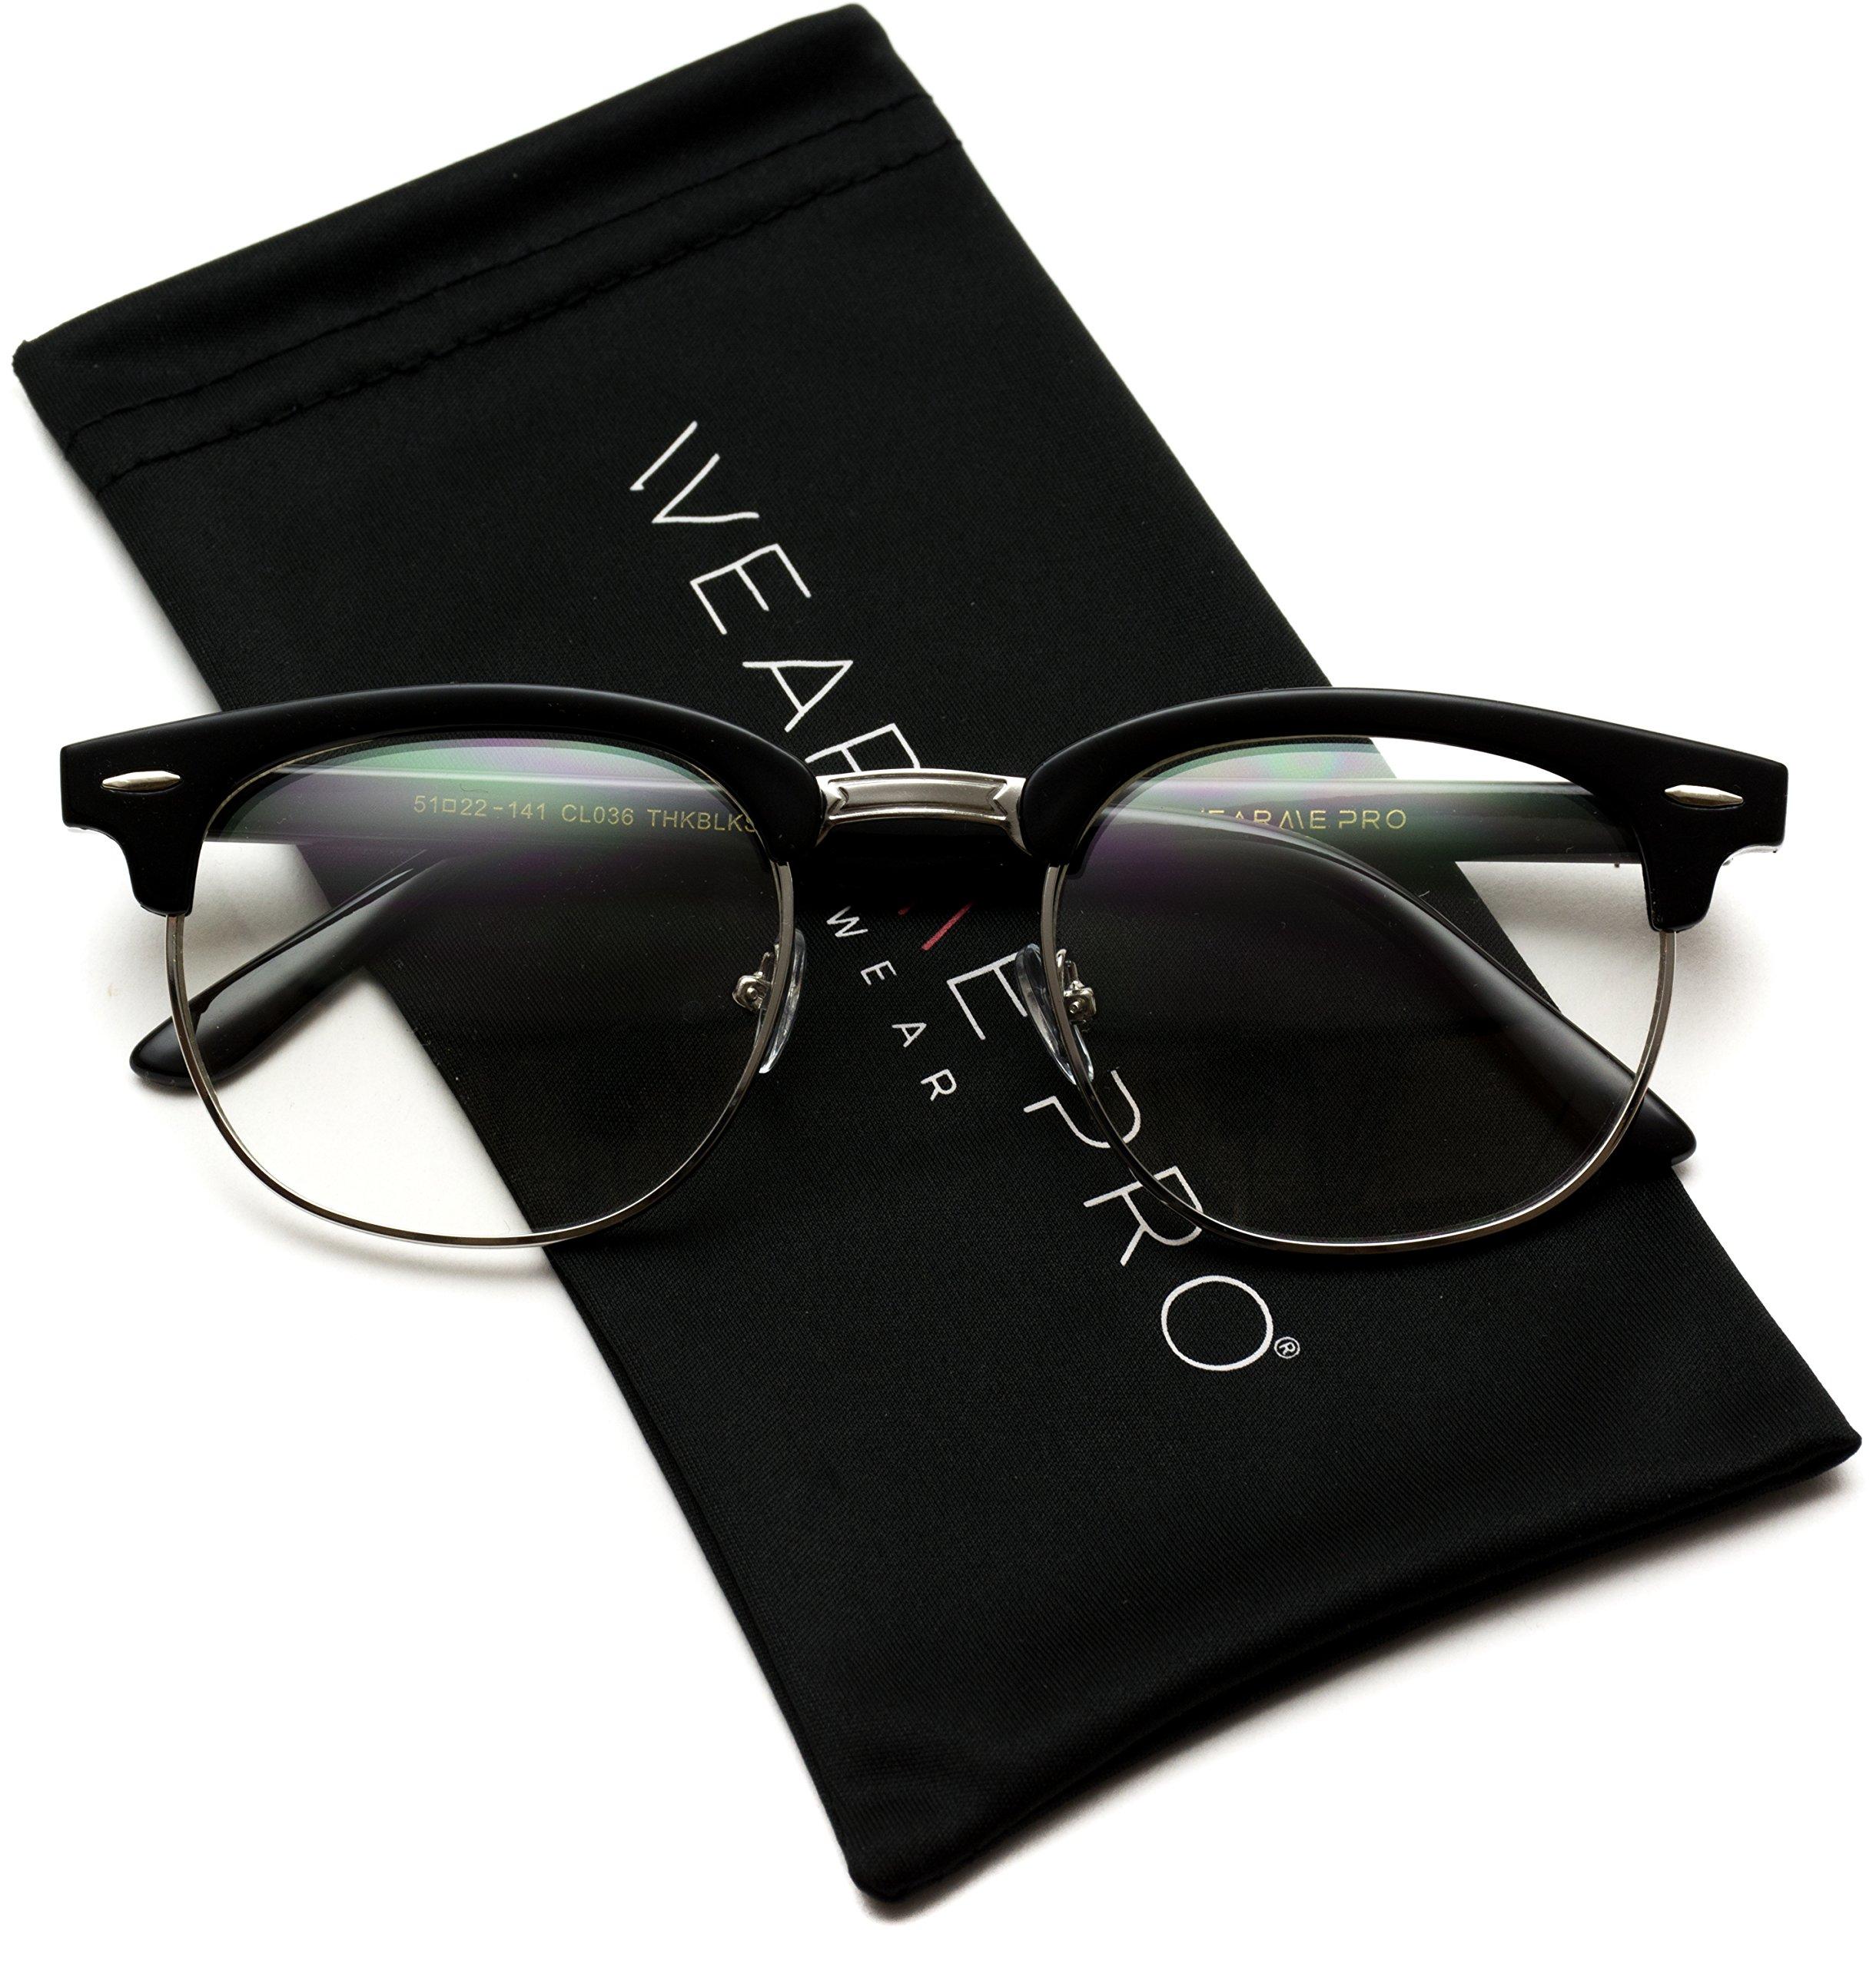 Vintage Inspired Classic Half Frame Horn Rimmed Clear Lens Glasses by WearMe Pro